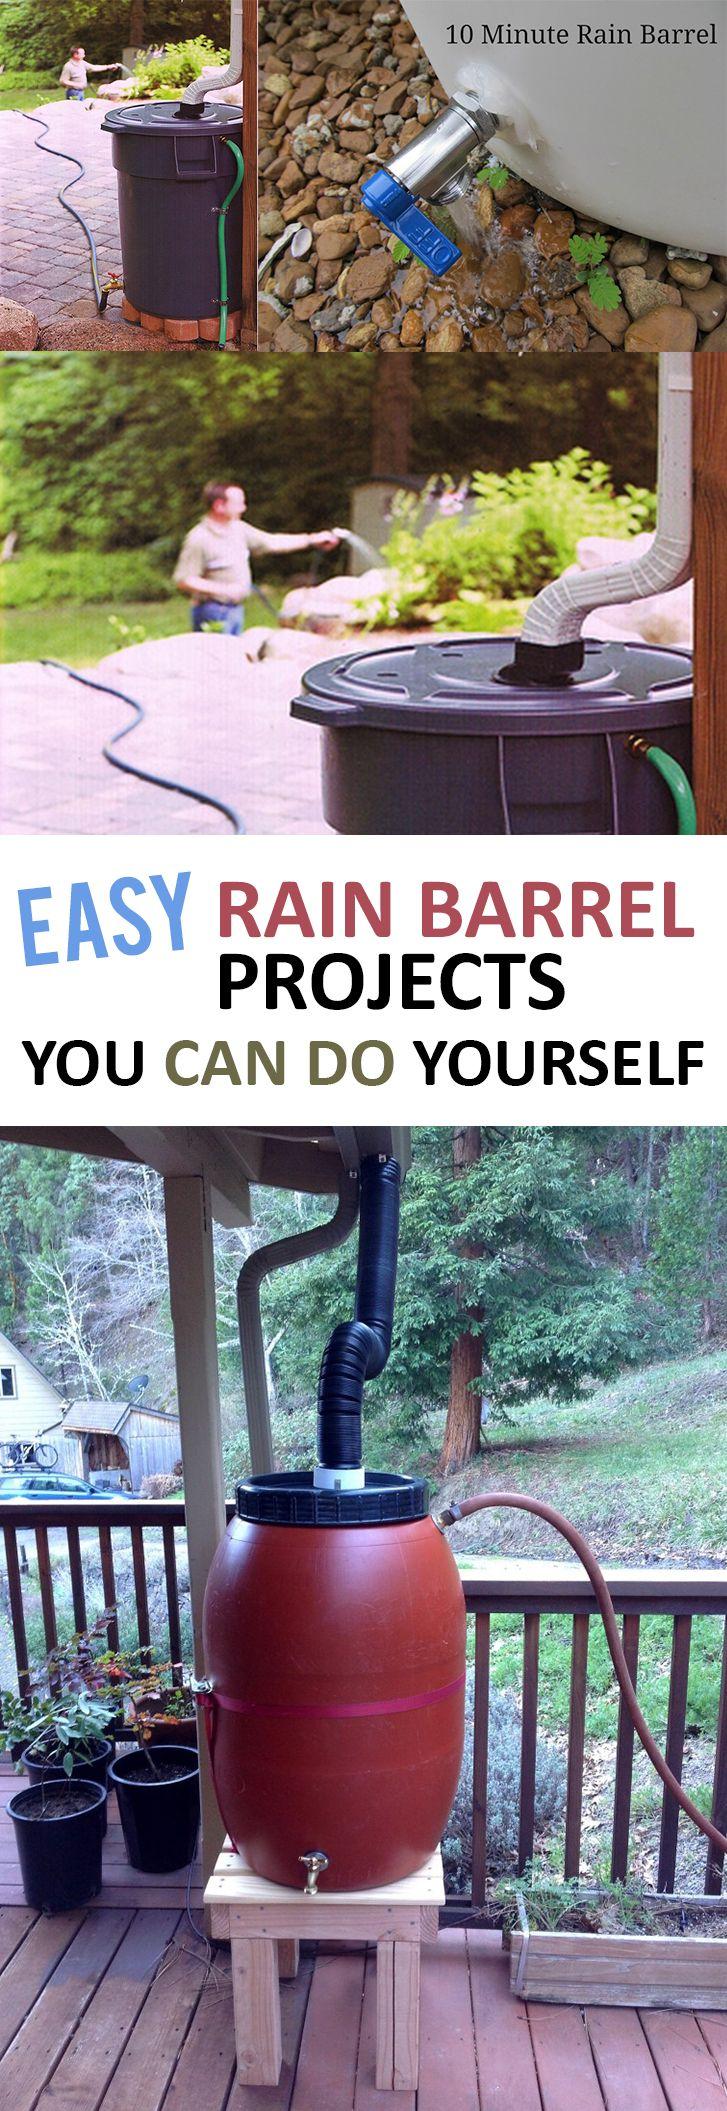 Easy rain barrel projects you can do yourself riego bicis casero solutioingenieria Gallery